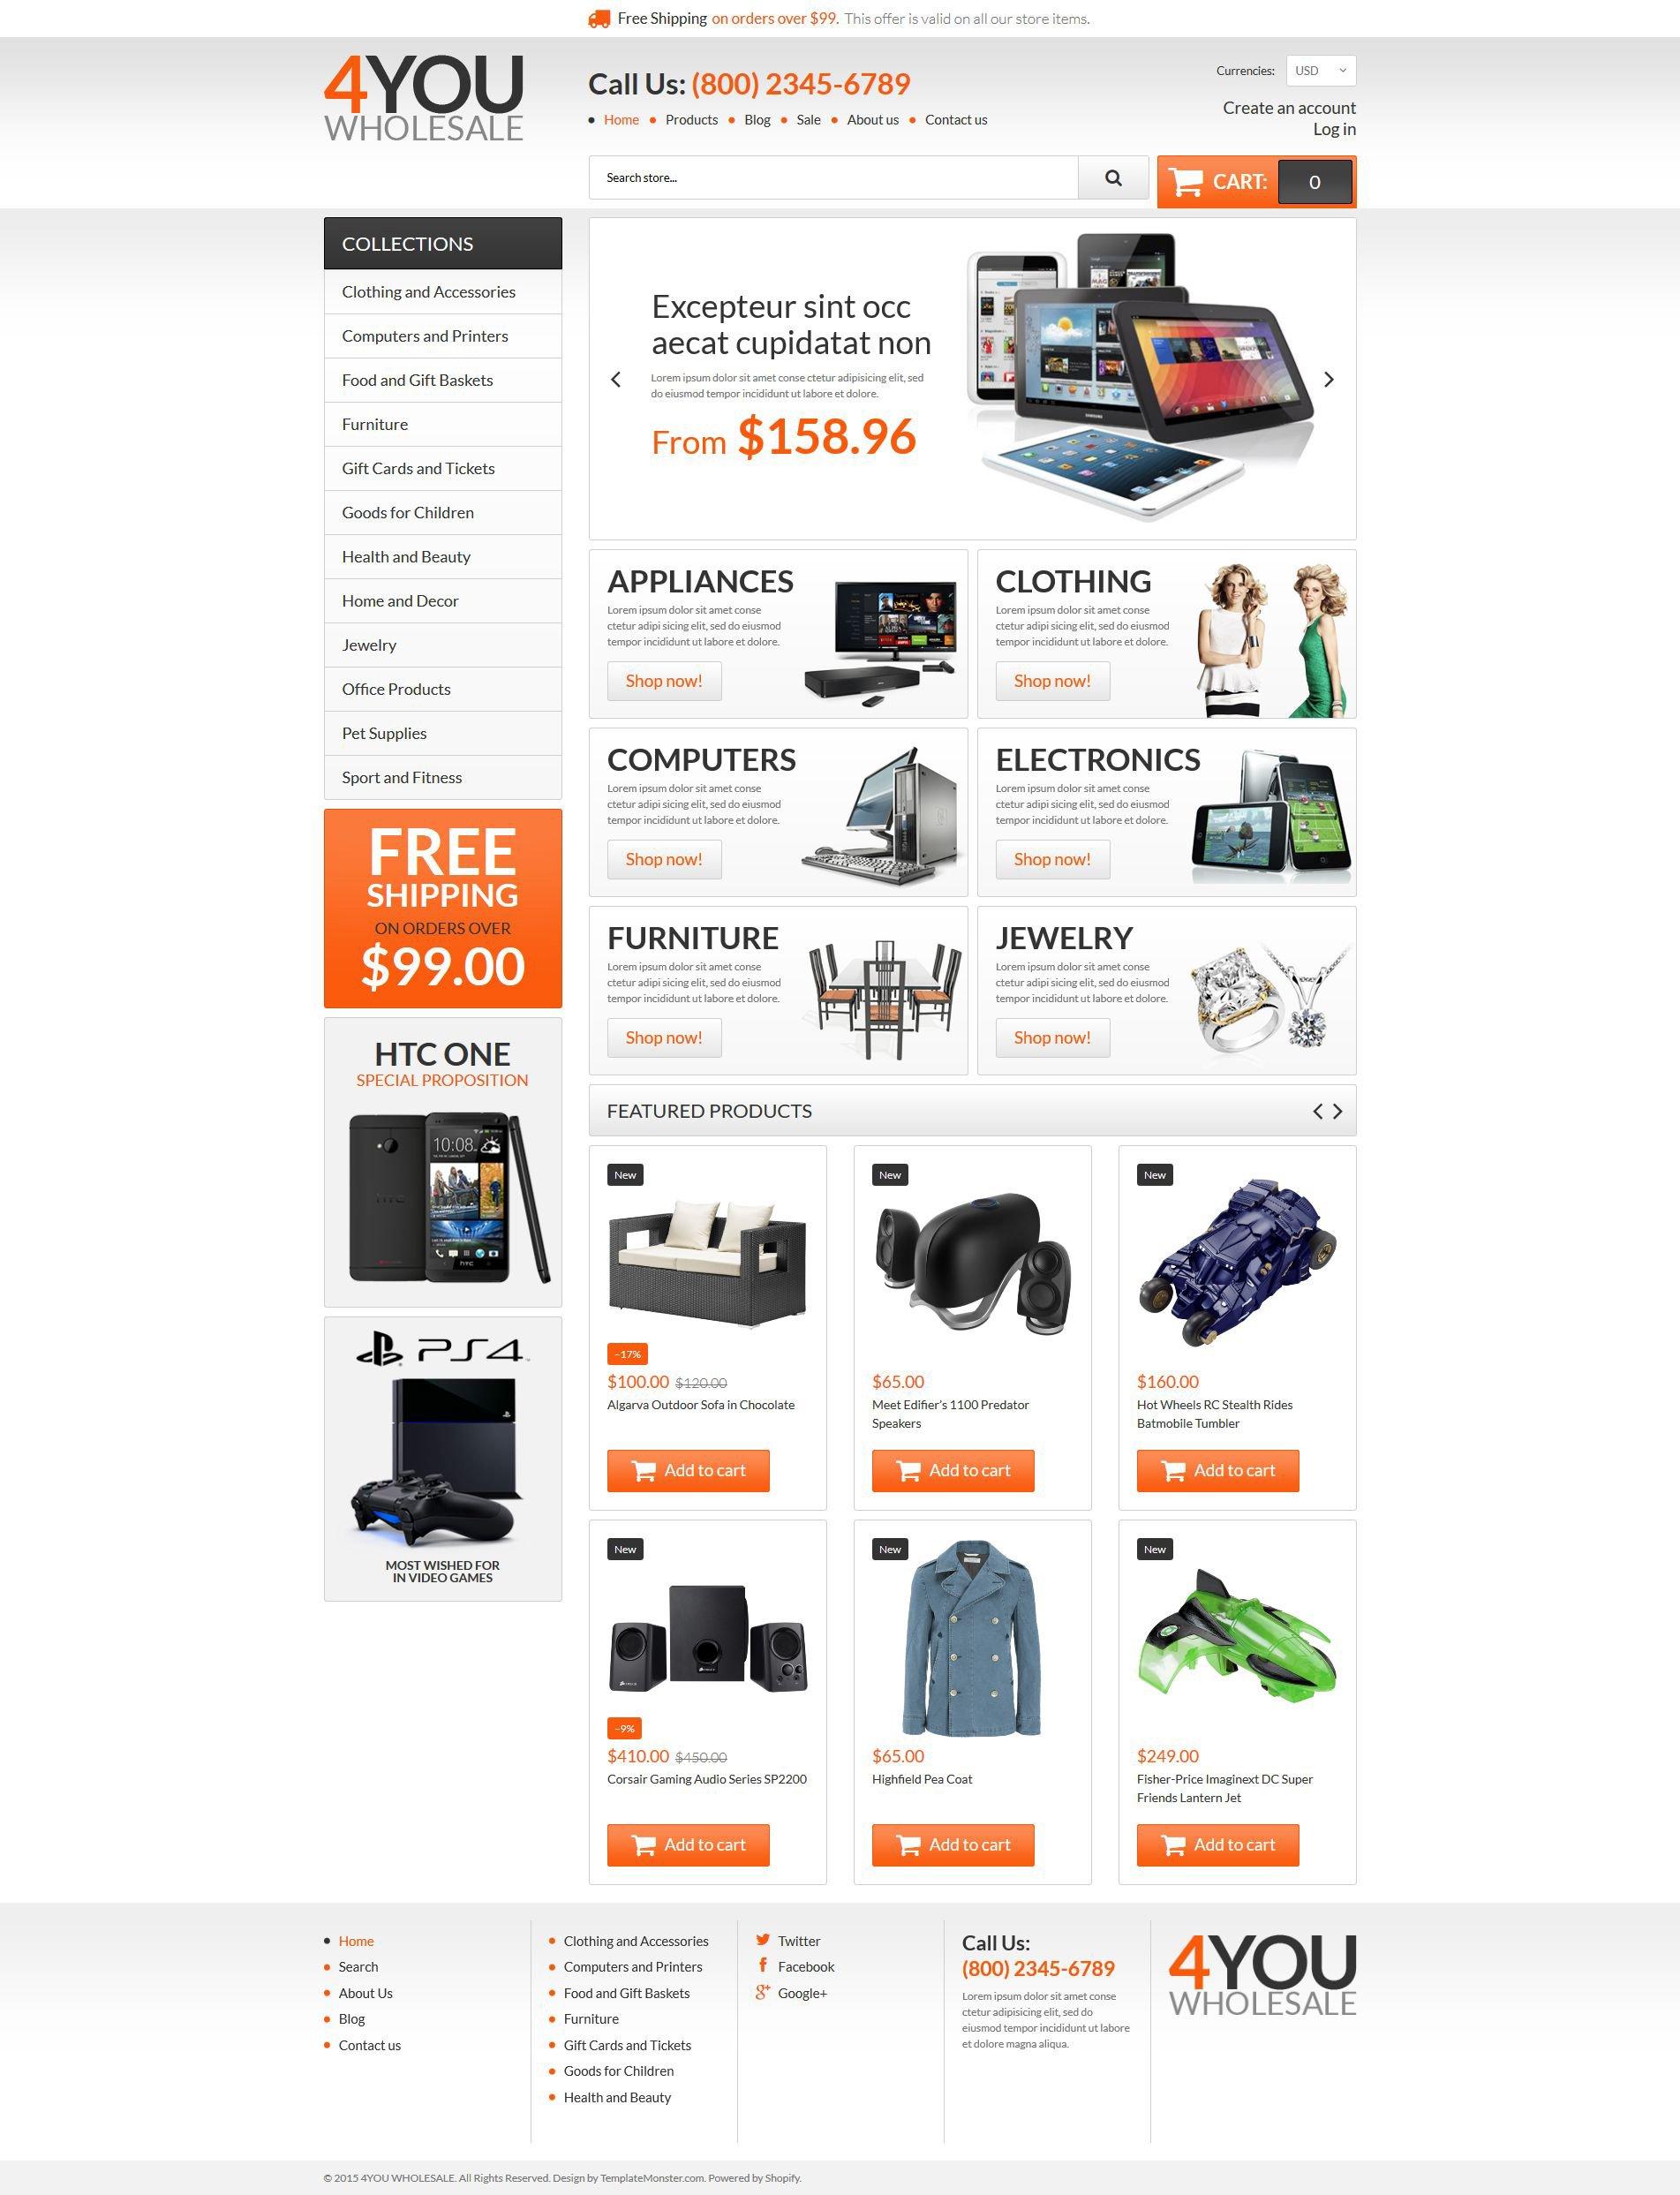 Thème Shopify adaptatif pour magasin de vente en gros #54840 - screenshot